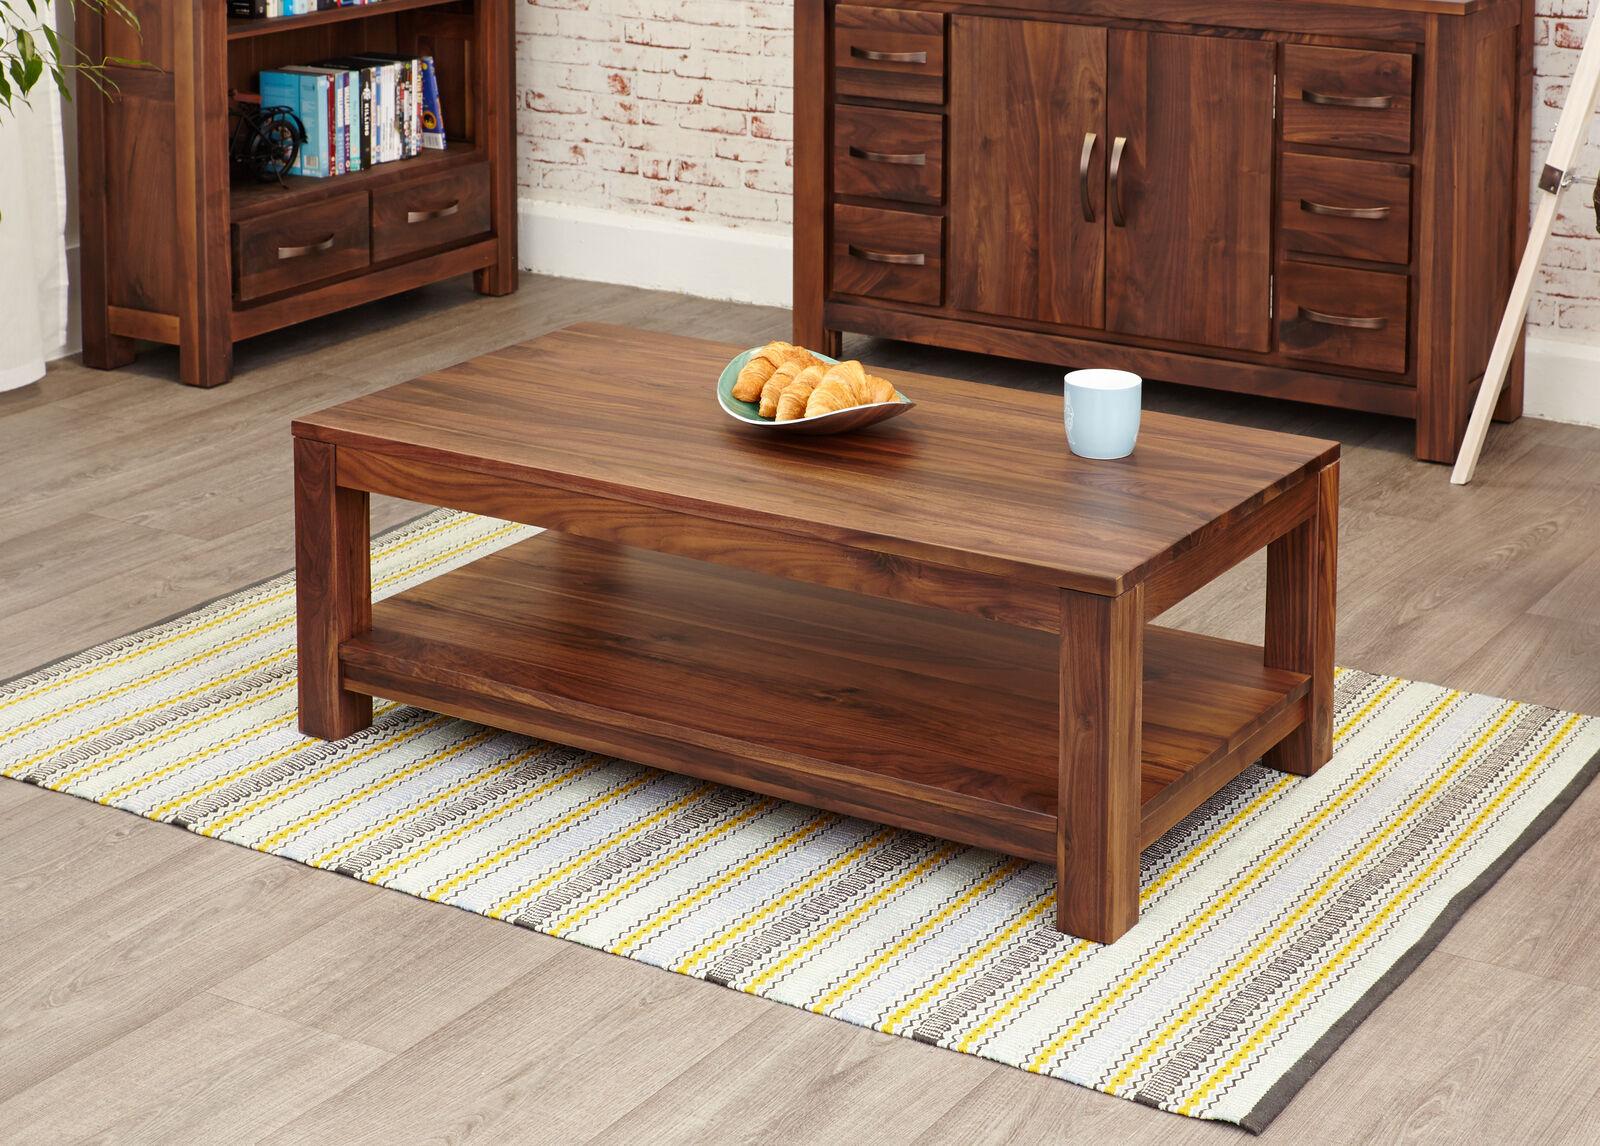 Mayan dark wood coffee table with open shelf storage solid walnut